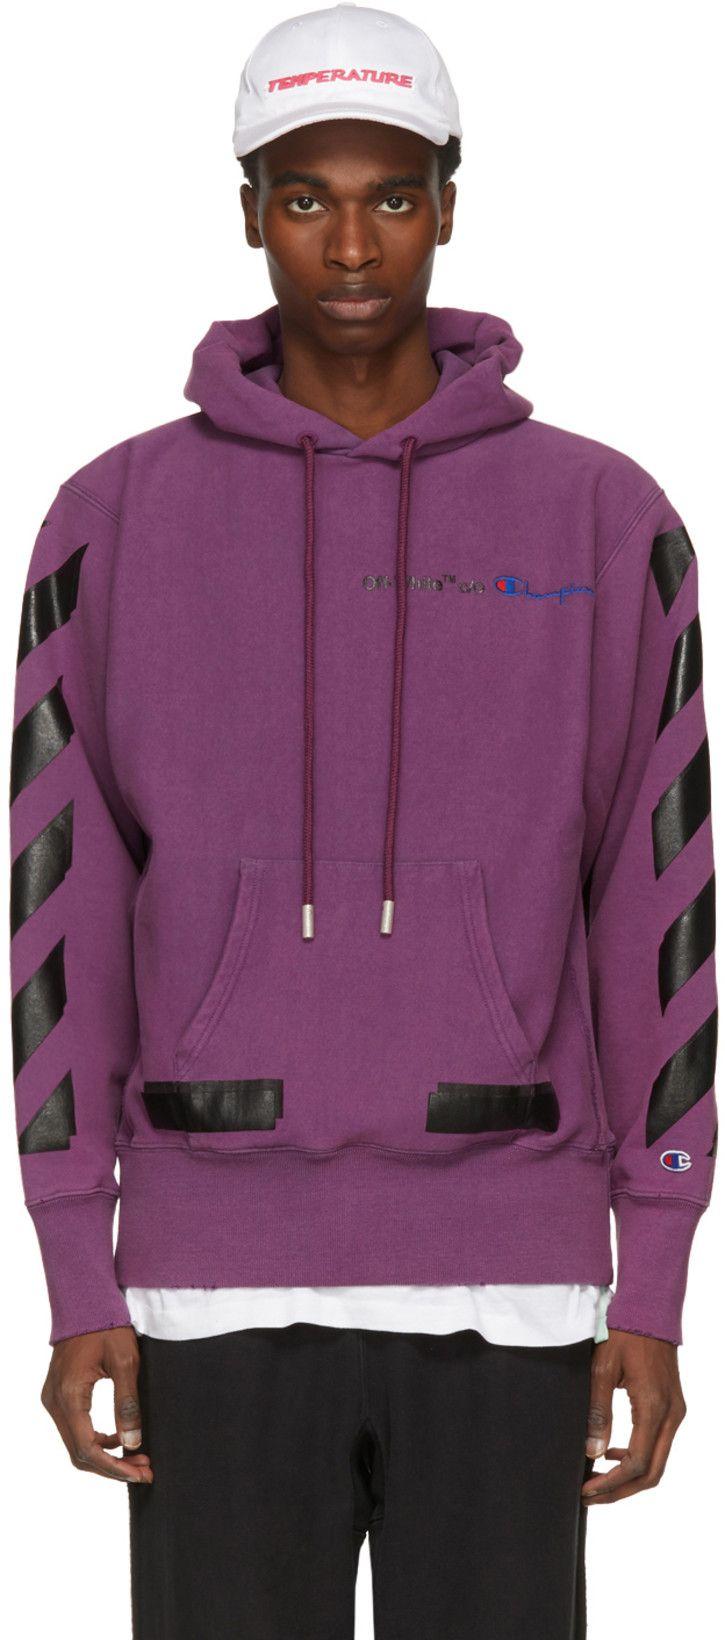 Off White Purple Champion Reverse Weave Edition Hoodie Hoodies Champion Reverse Weave Off White Clothing